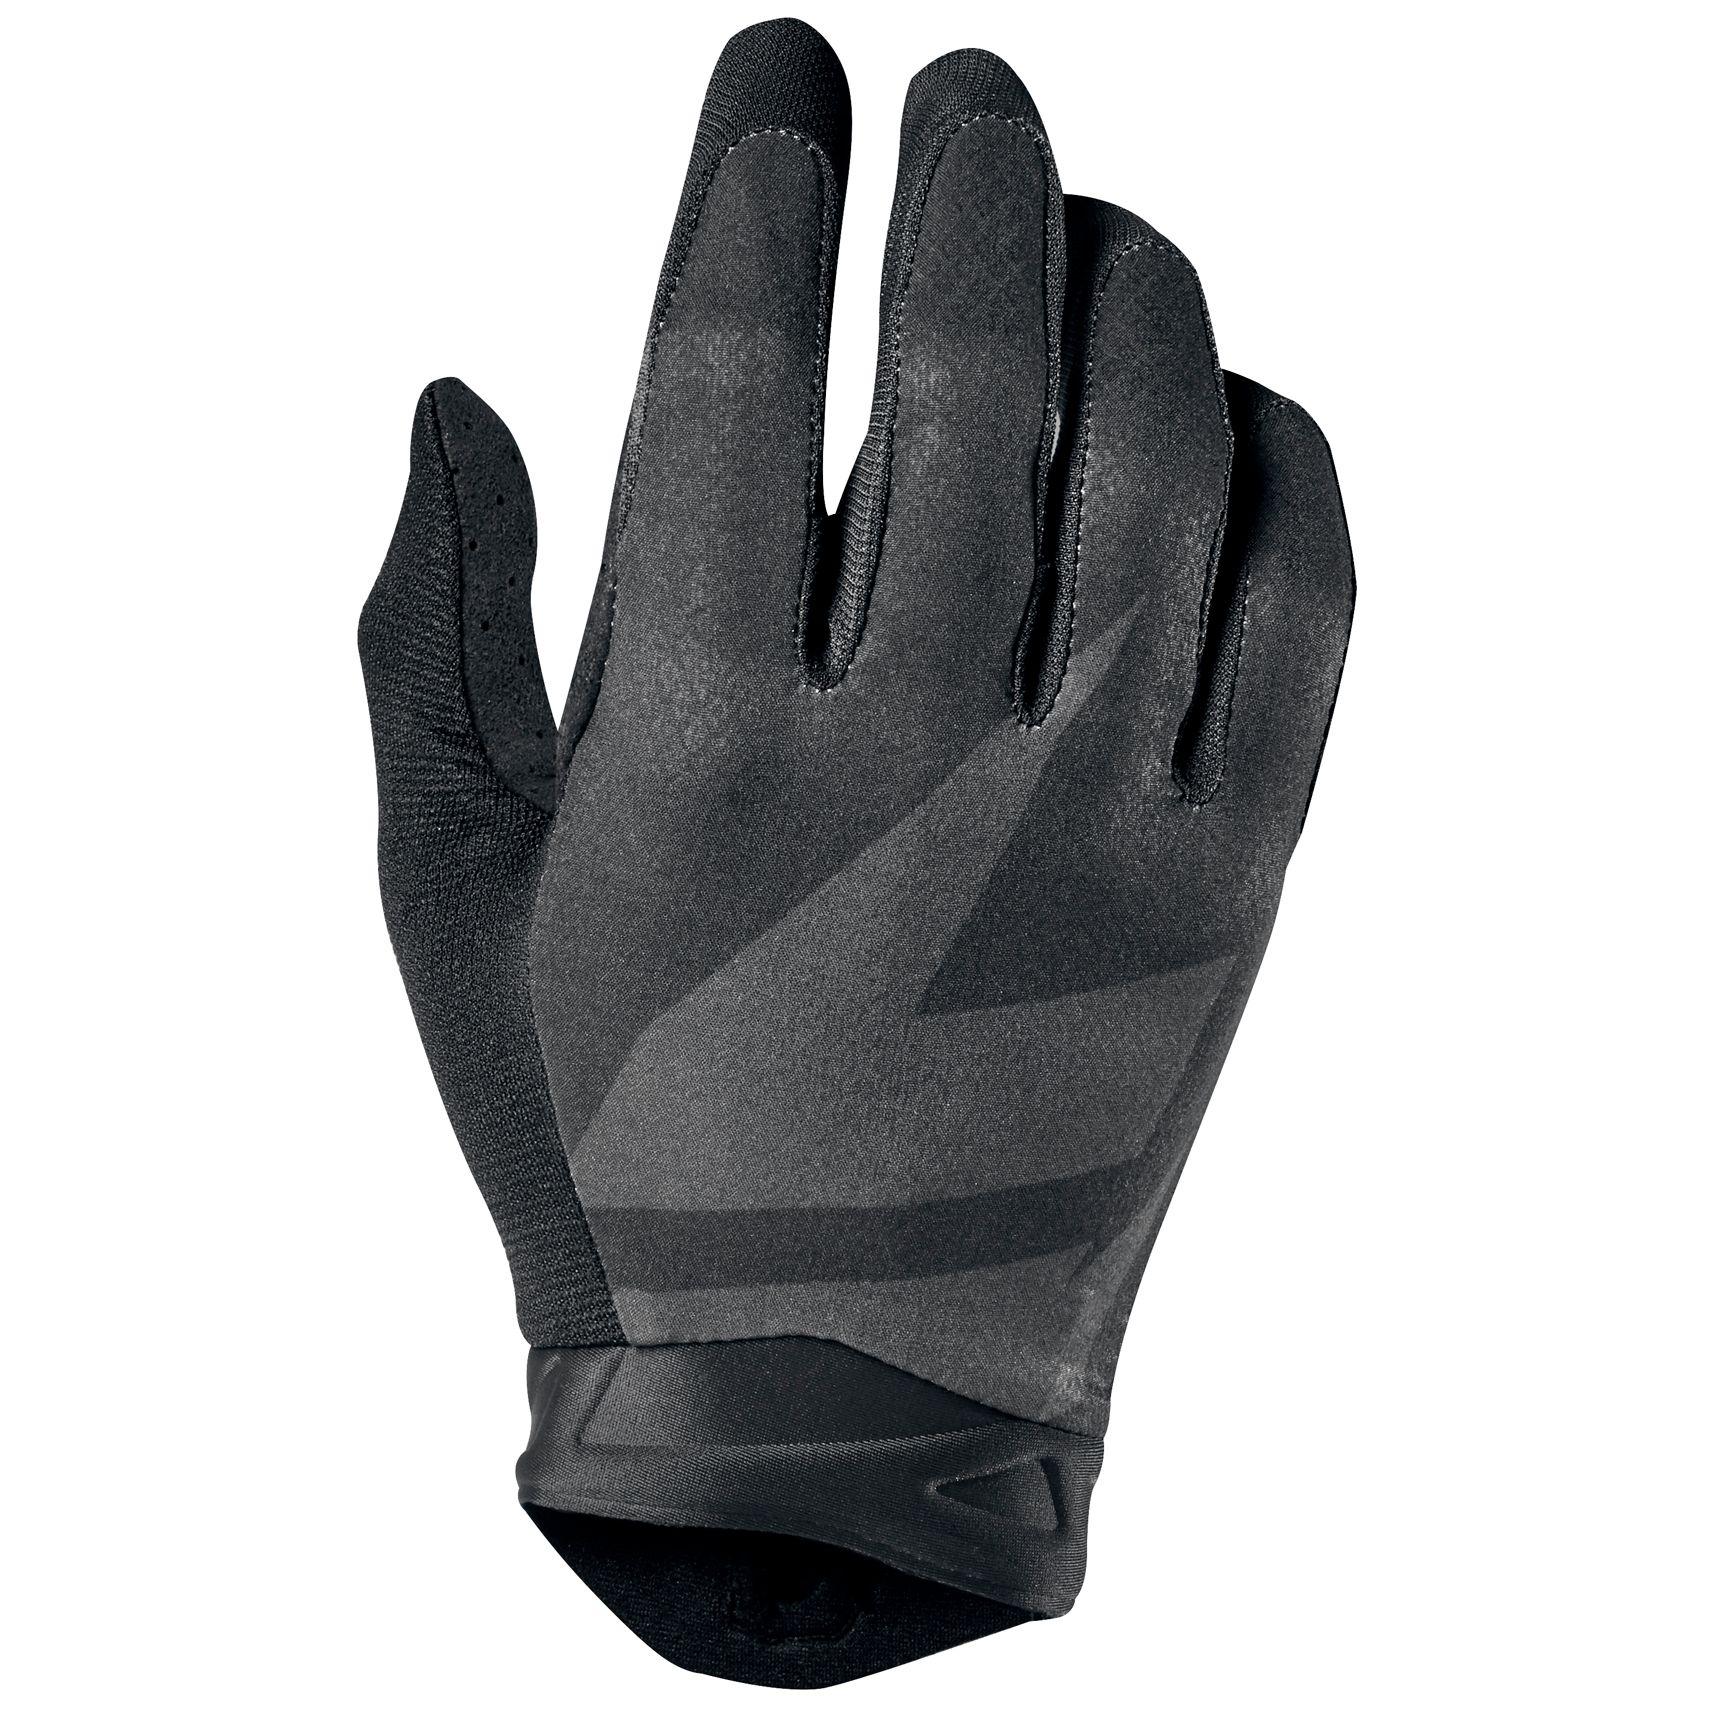 gants cross shift black air noir 2018 tenue cross. Black Bedroom Furniture Sets. Home Design Ideas